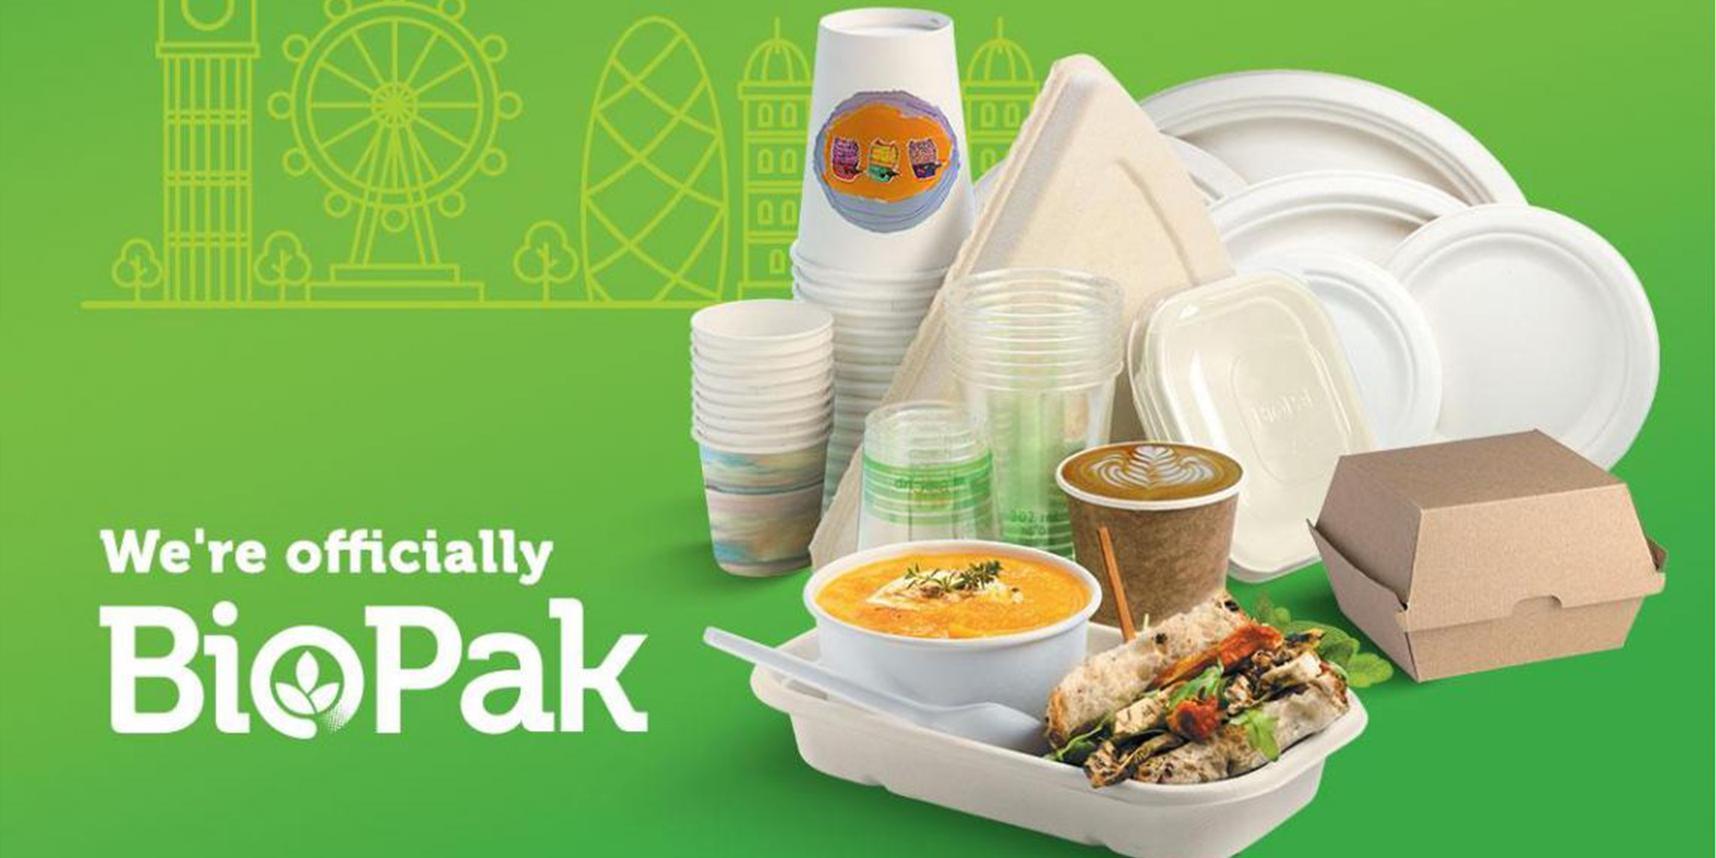 Biopac merges with Australian eco-friendly packaging company to become BioPak UK Ltd